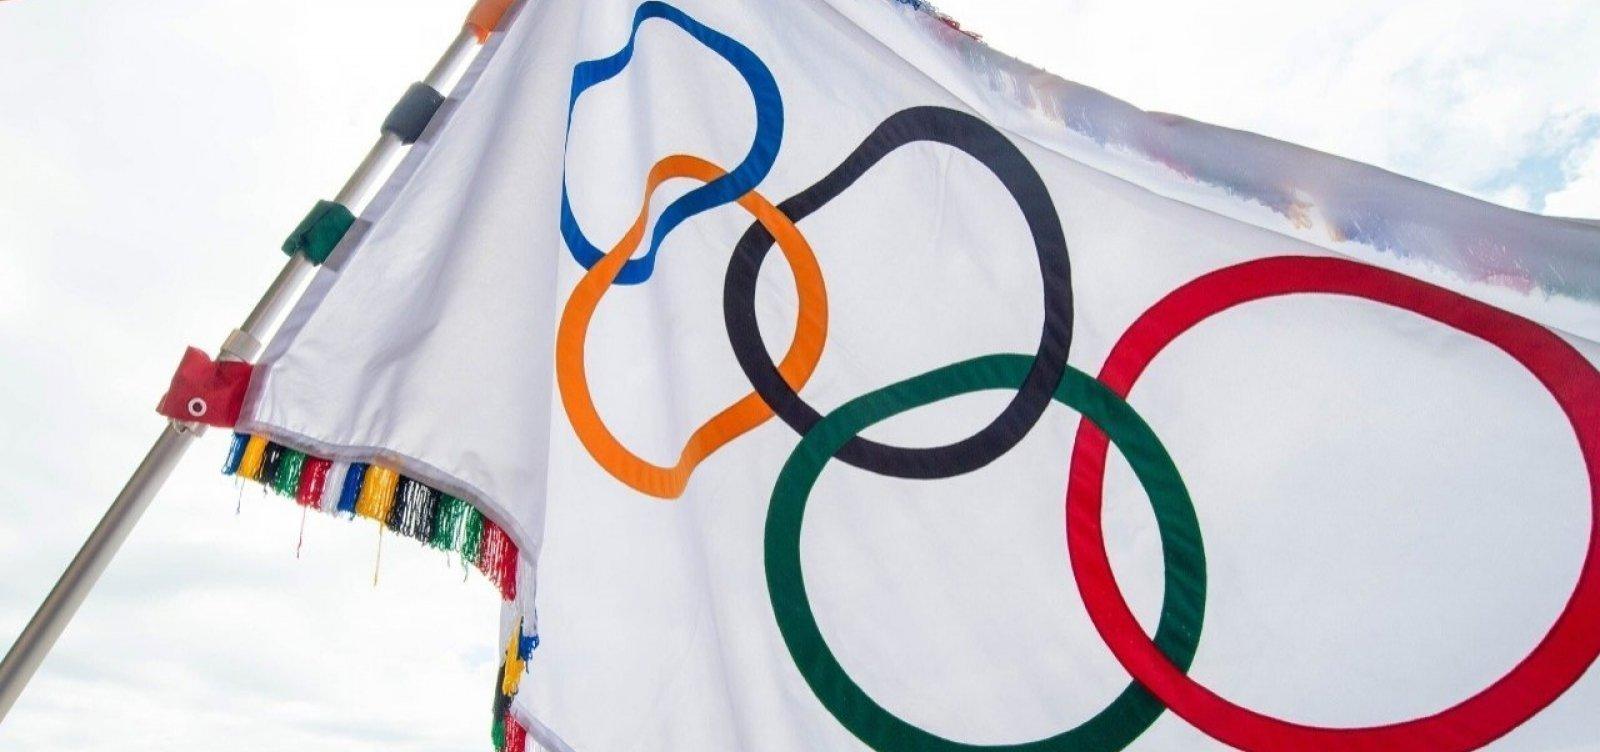 Olimpíadas registram cerca de 80 casos positivos de coronavírus